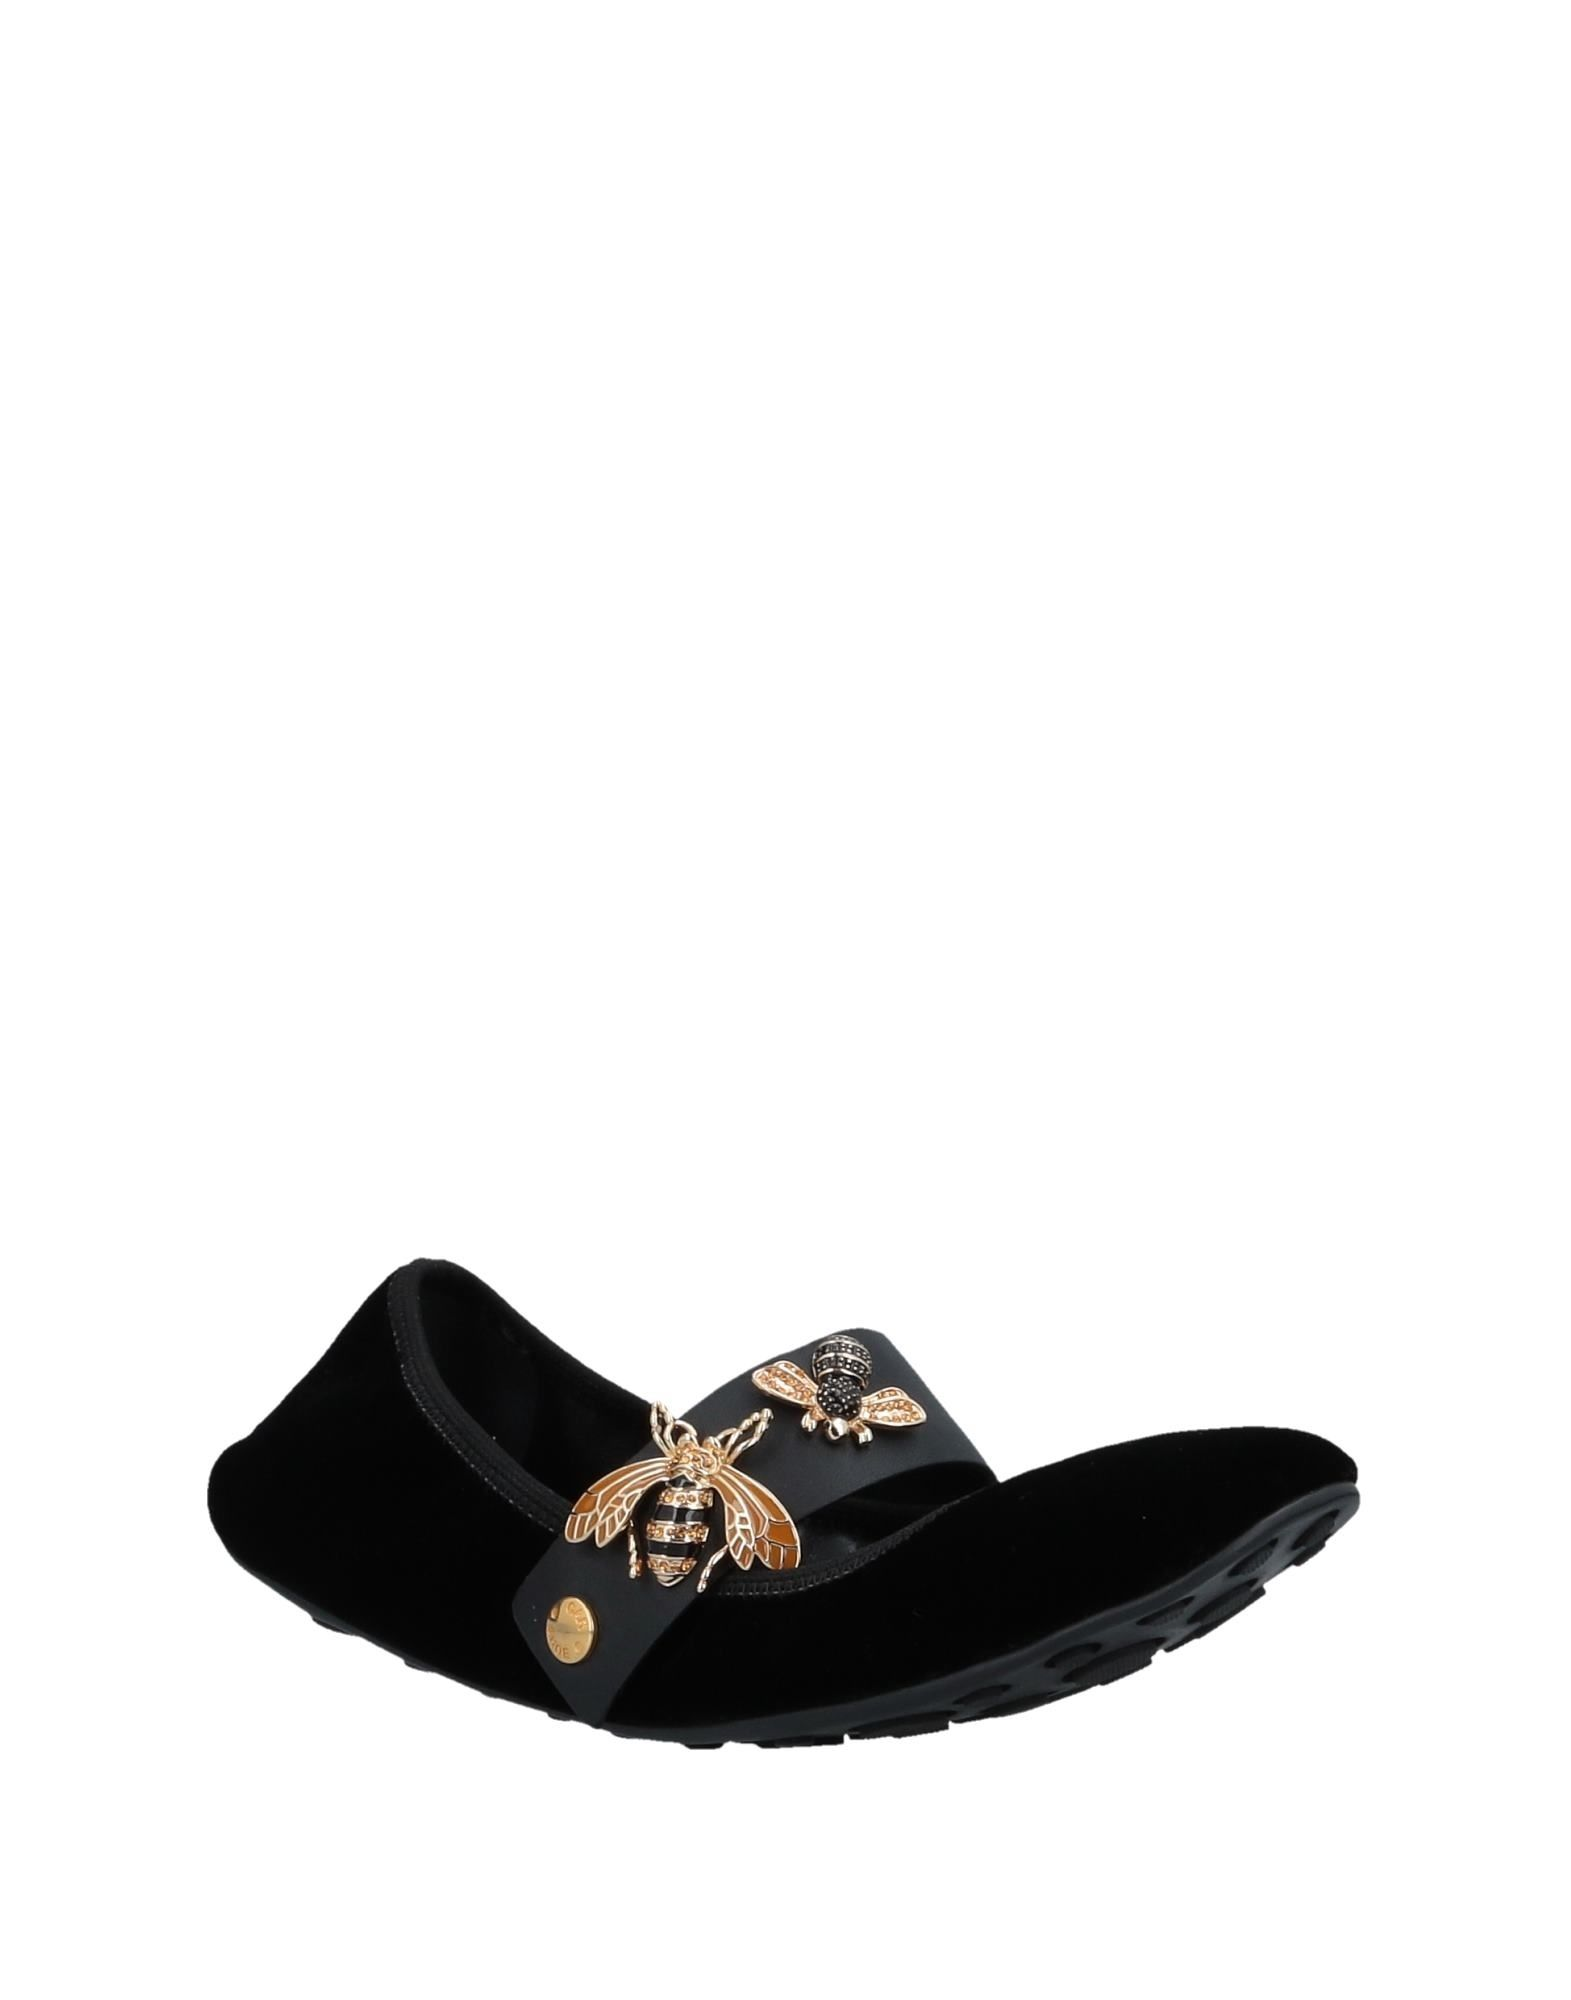 Stilvolle billige Schuhe Carshoe  Ballerinas Damen  Carshoe 11497574JD a8021f